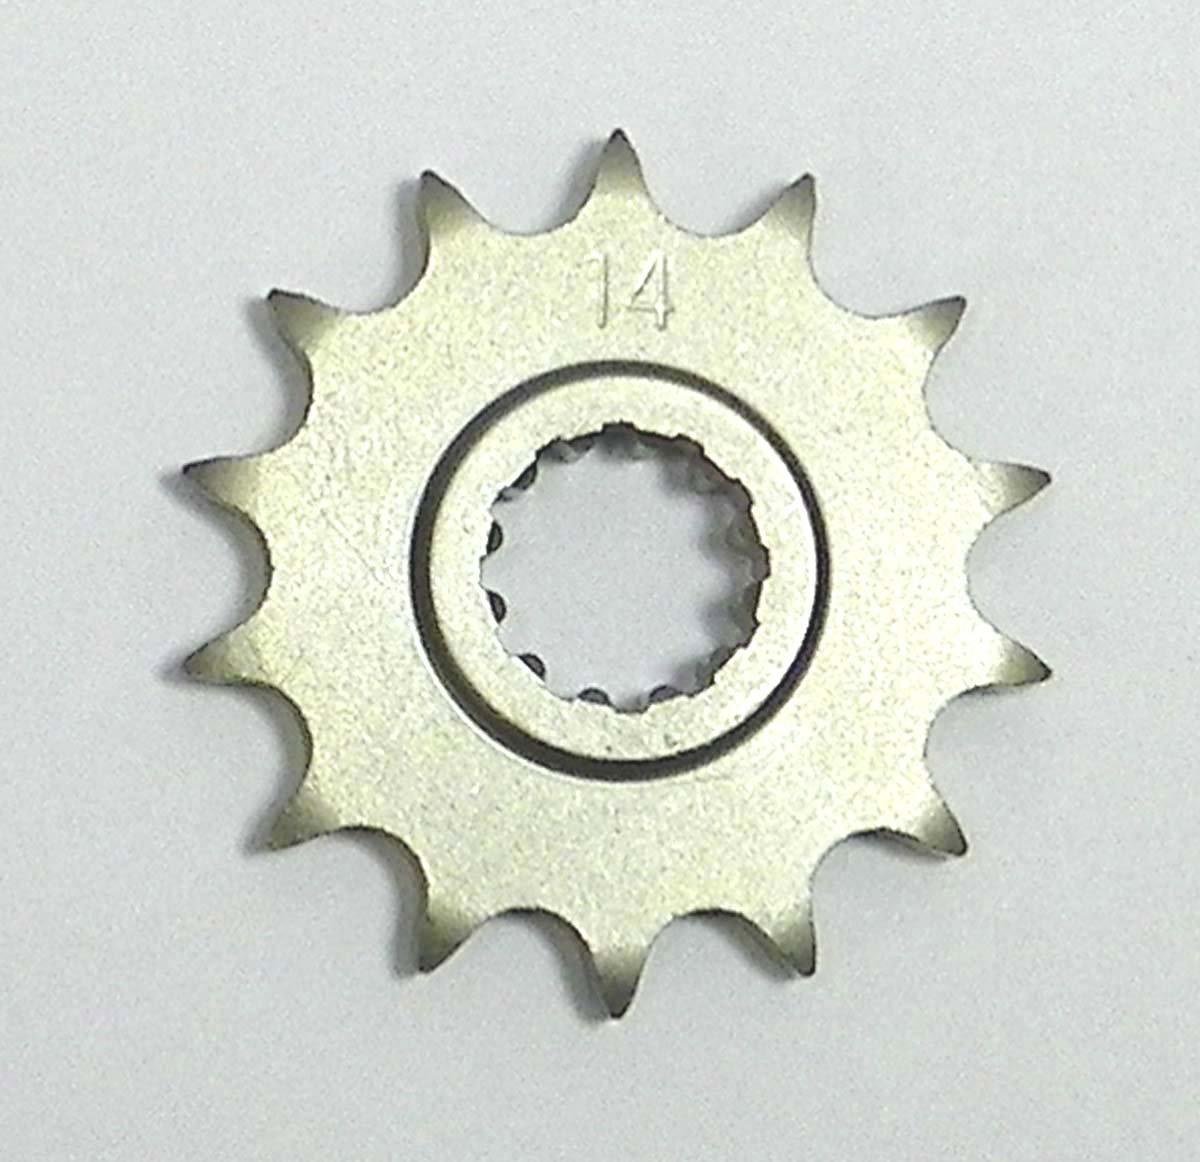 KTM Steel Front Sprocket Moto-X SX 85 2003-2017/ XC 85 2008-2009/ SX 105 2004-2011/ XC 105 2008-2009 14 Teeth FSE-013-14 OEM #: 47033029014